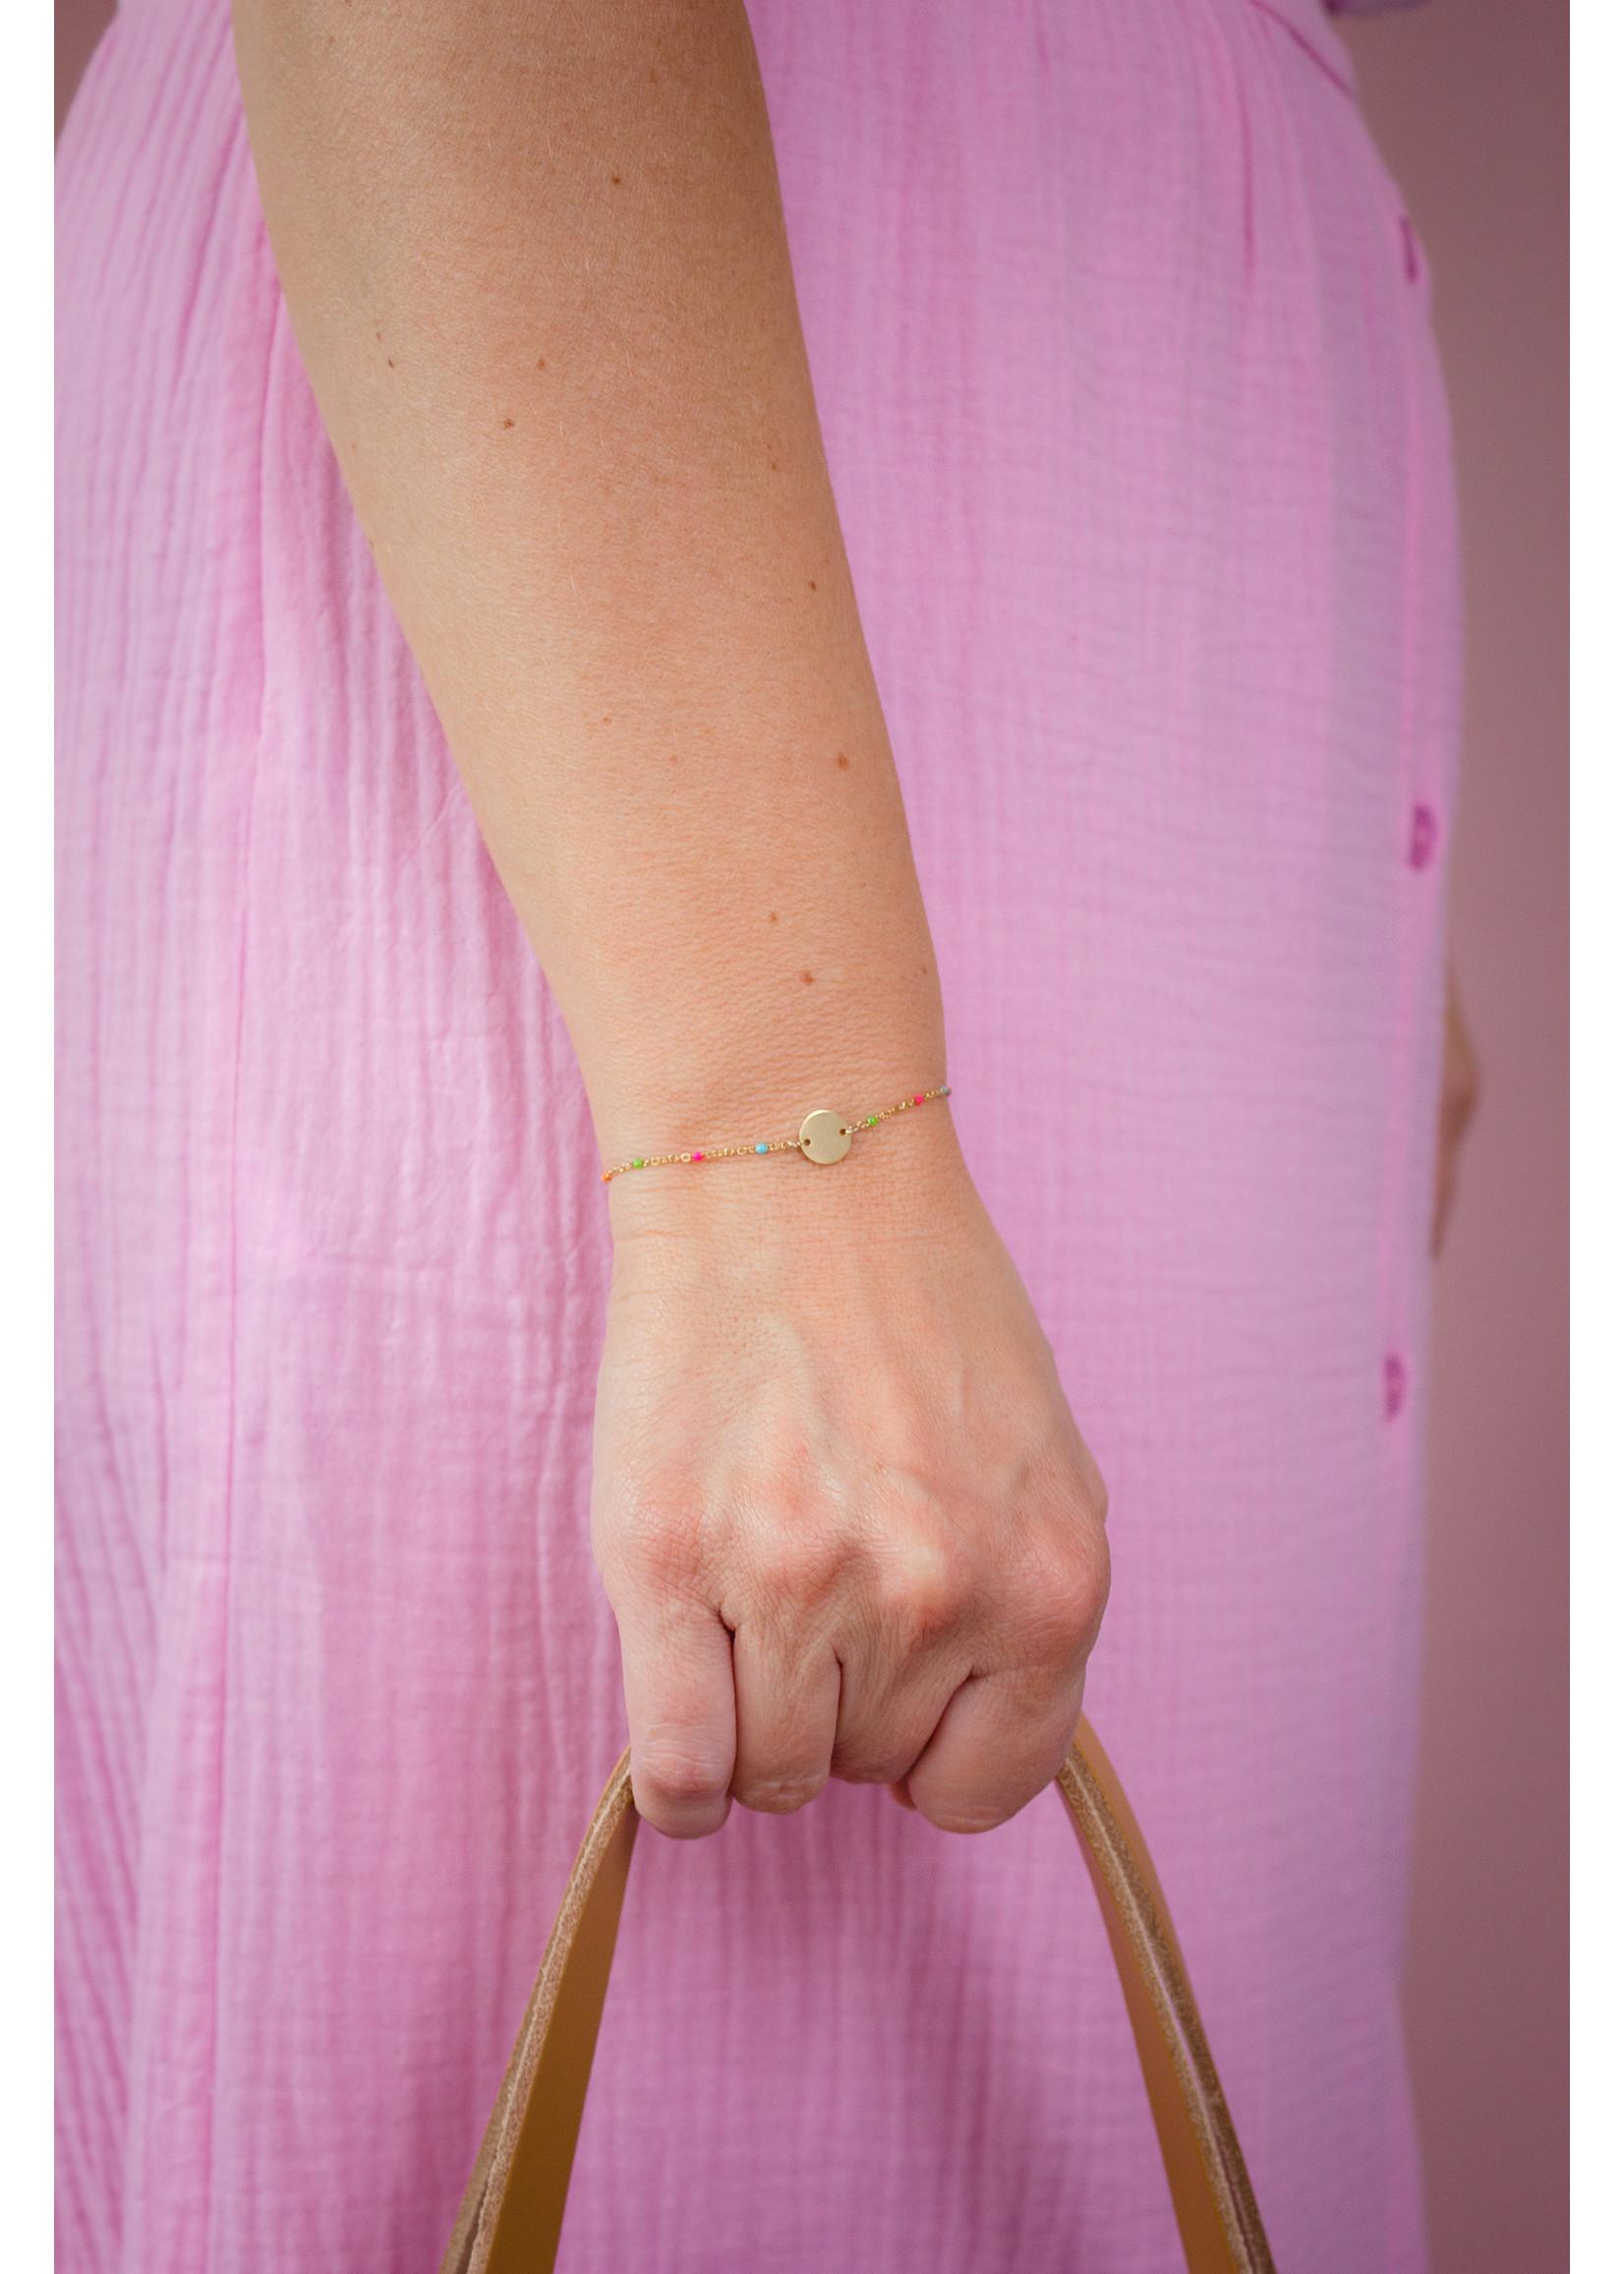 armband muntje regenboog Goud-multicolour